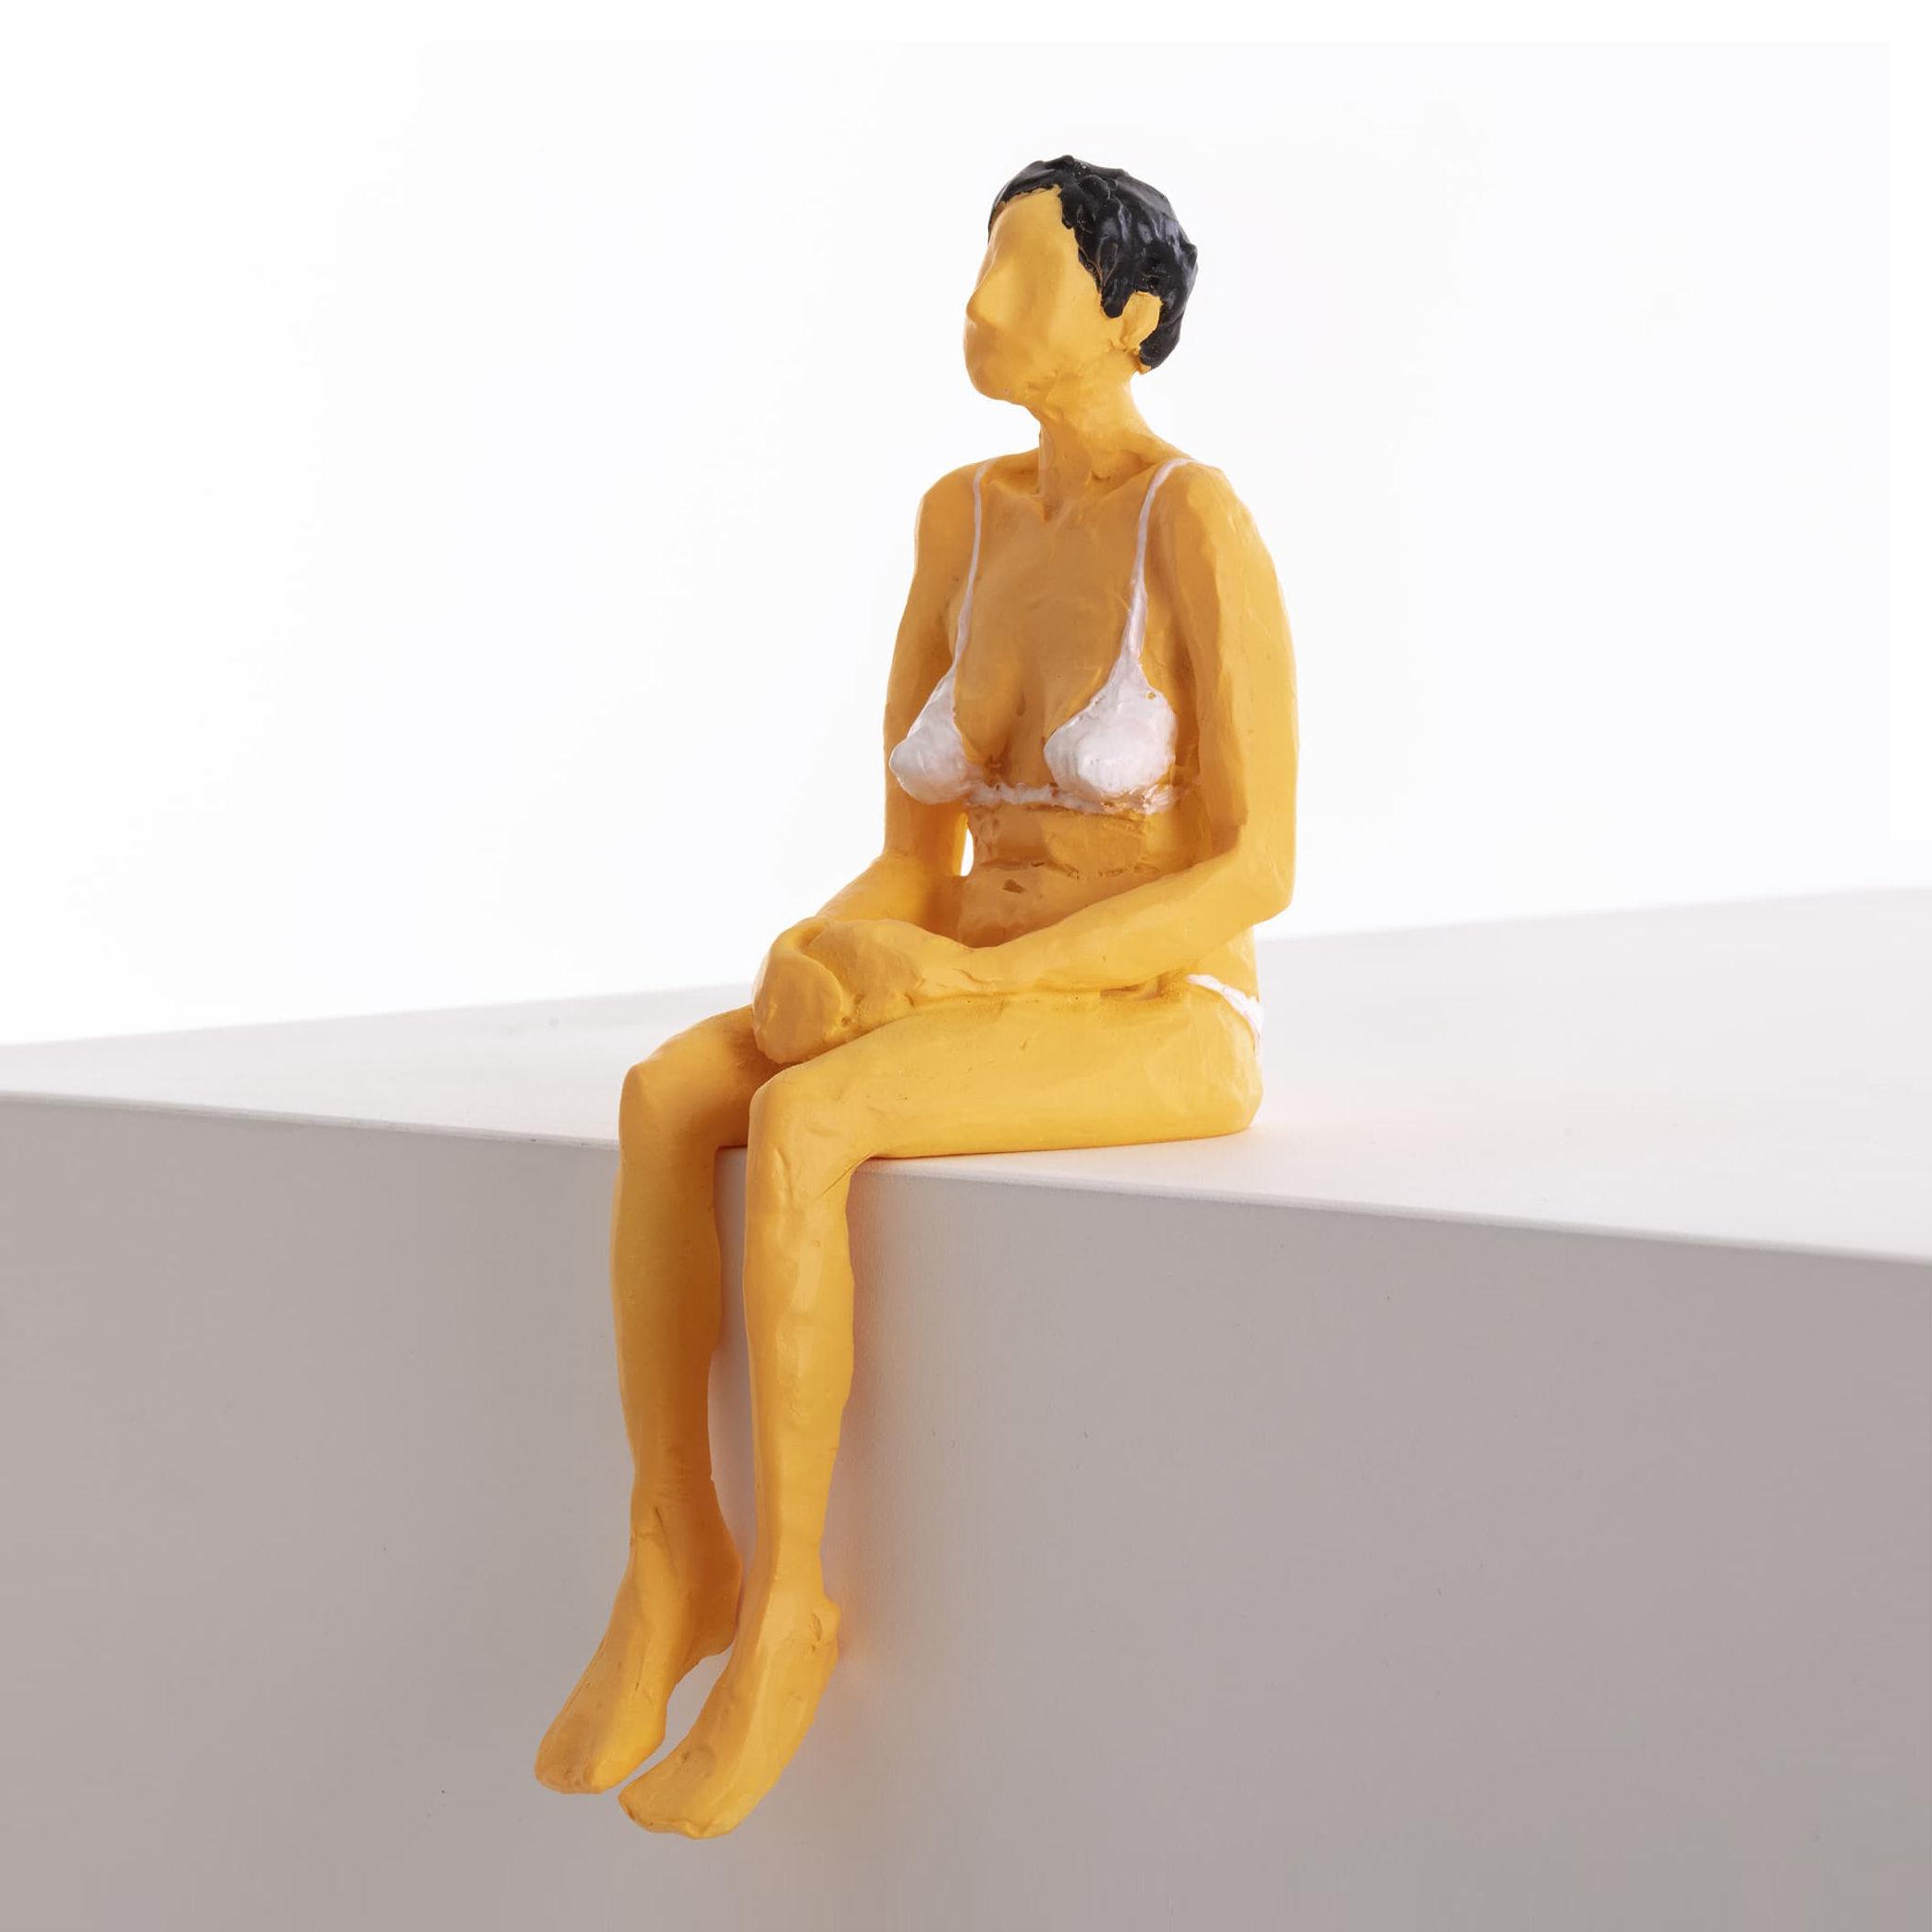 Dekoration - Dekorationsartikel - Love is a Verb Figur / Penelope - Seletti - Penelope - Harz